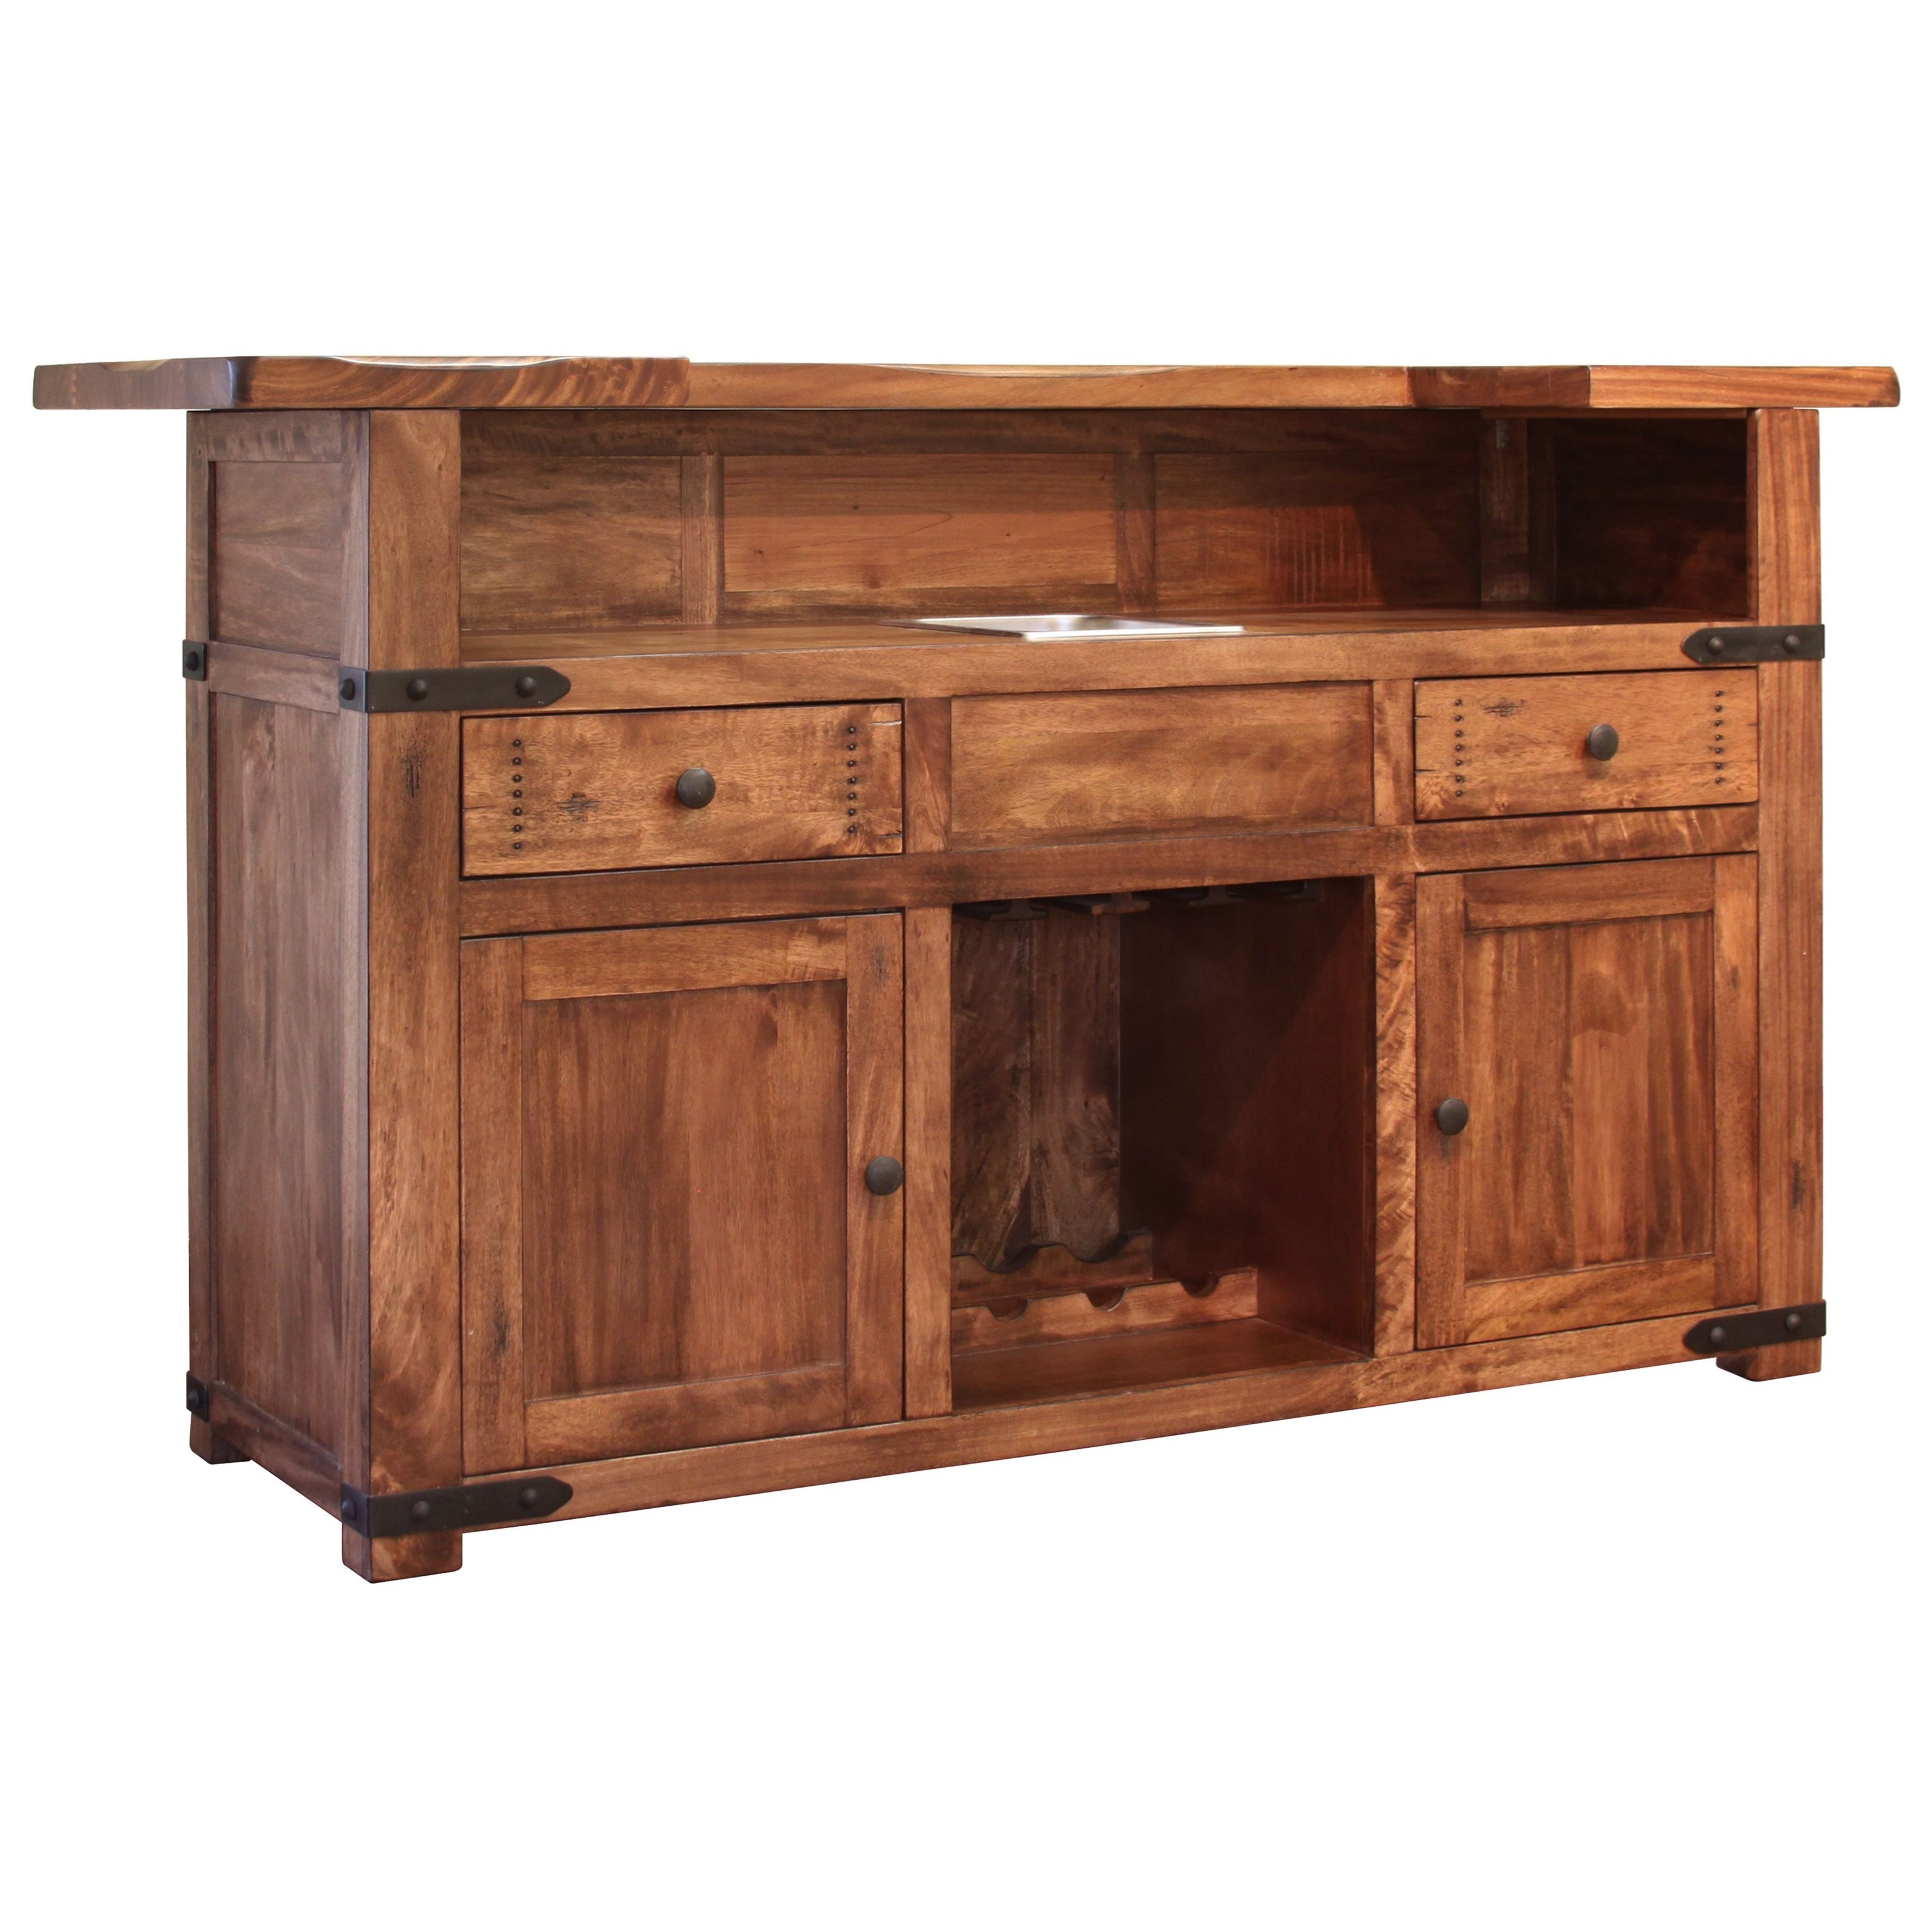 Parota Bar Cabinet by International Furniture Direct at Home Furnishings Direct